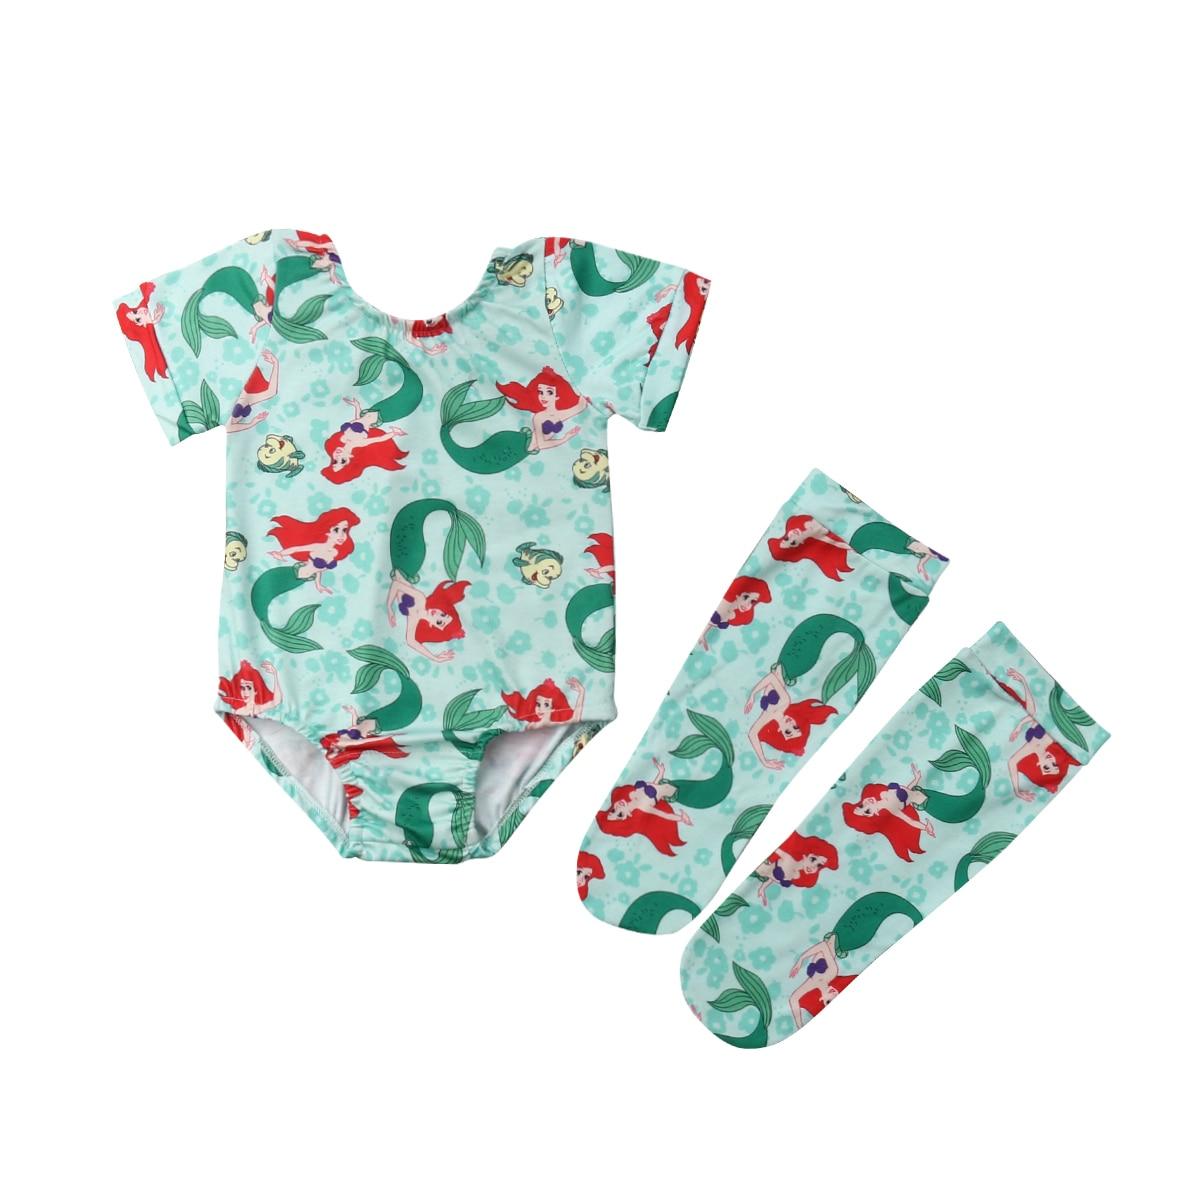 Newborn Baby Girls Mermaid Princess   Romper   Long Sleeve Jumpsuit+ Warm Legging Outfit Set